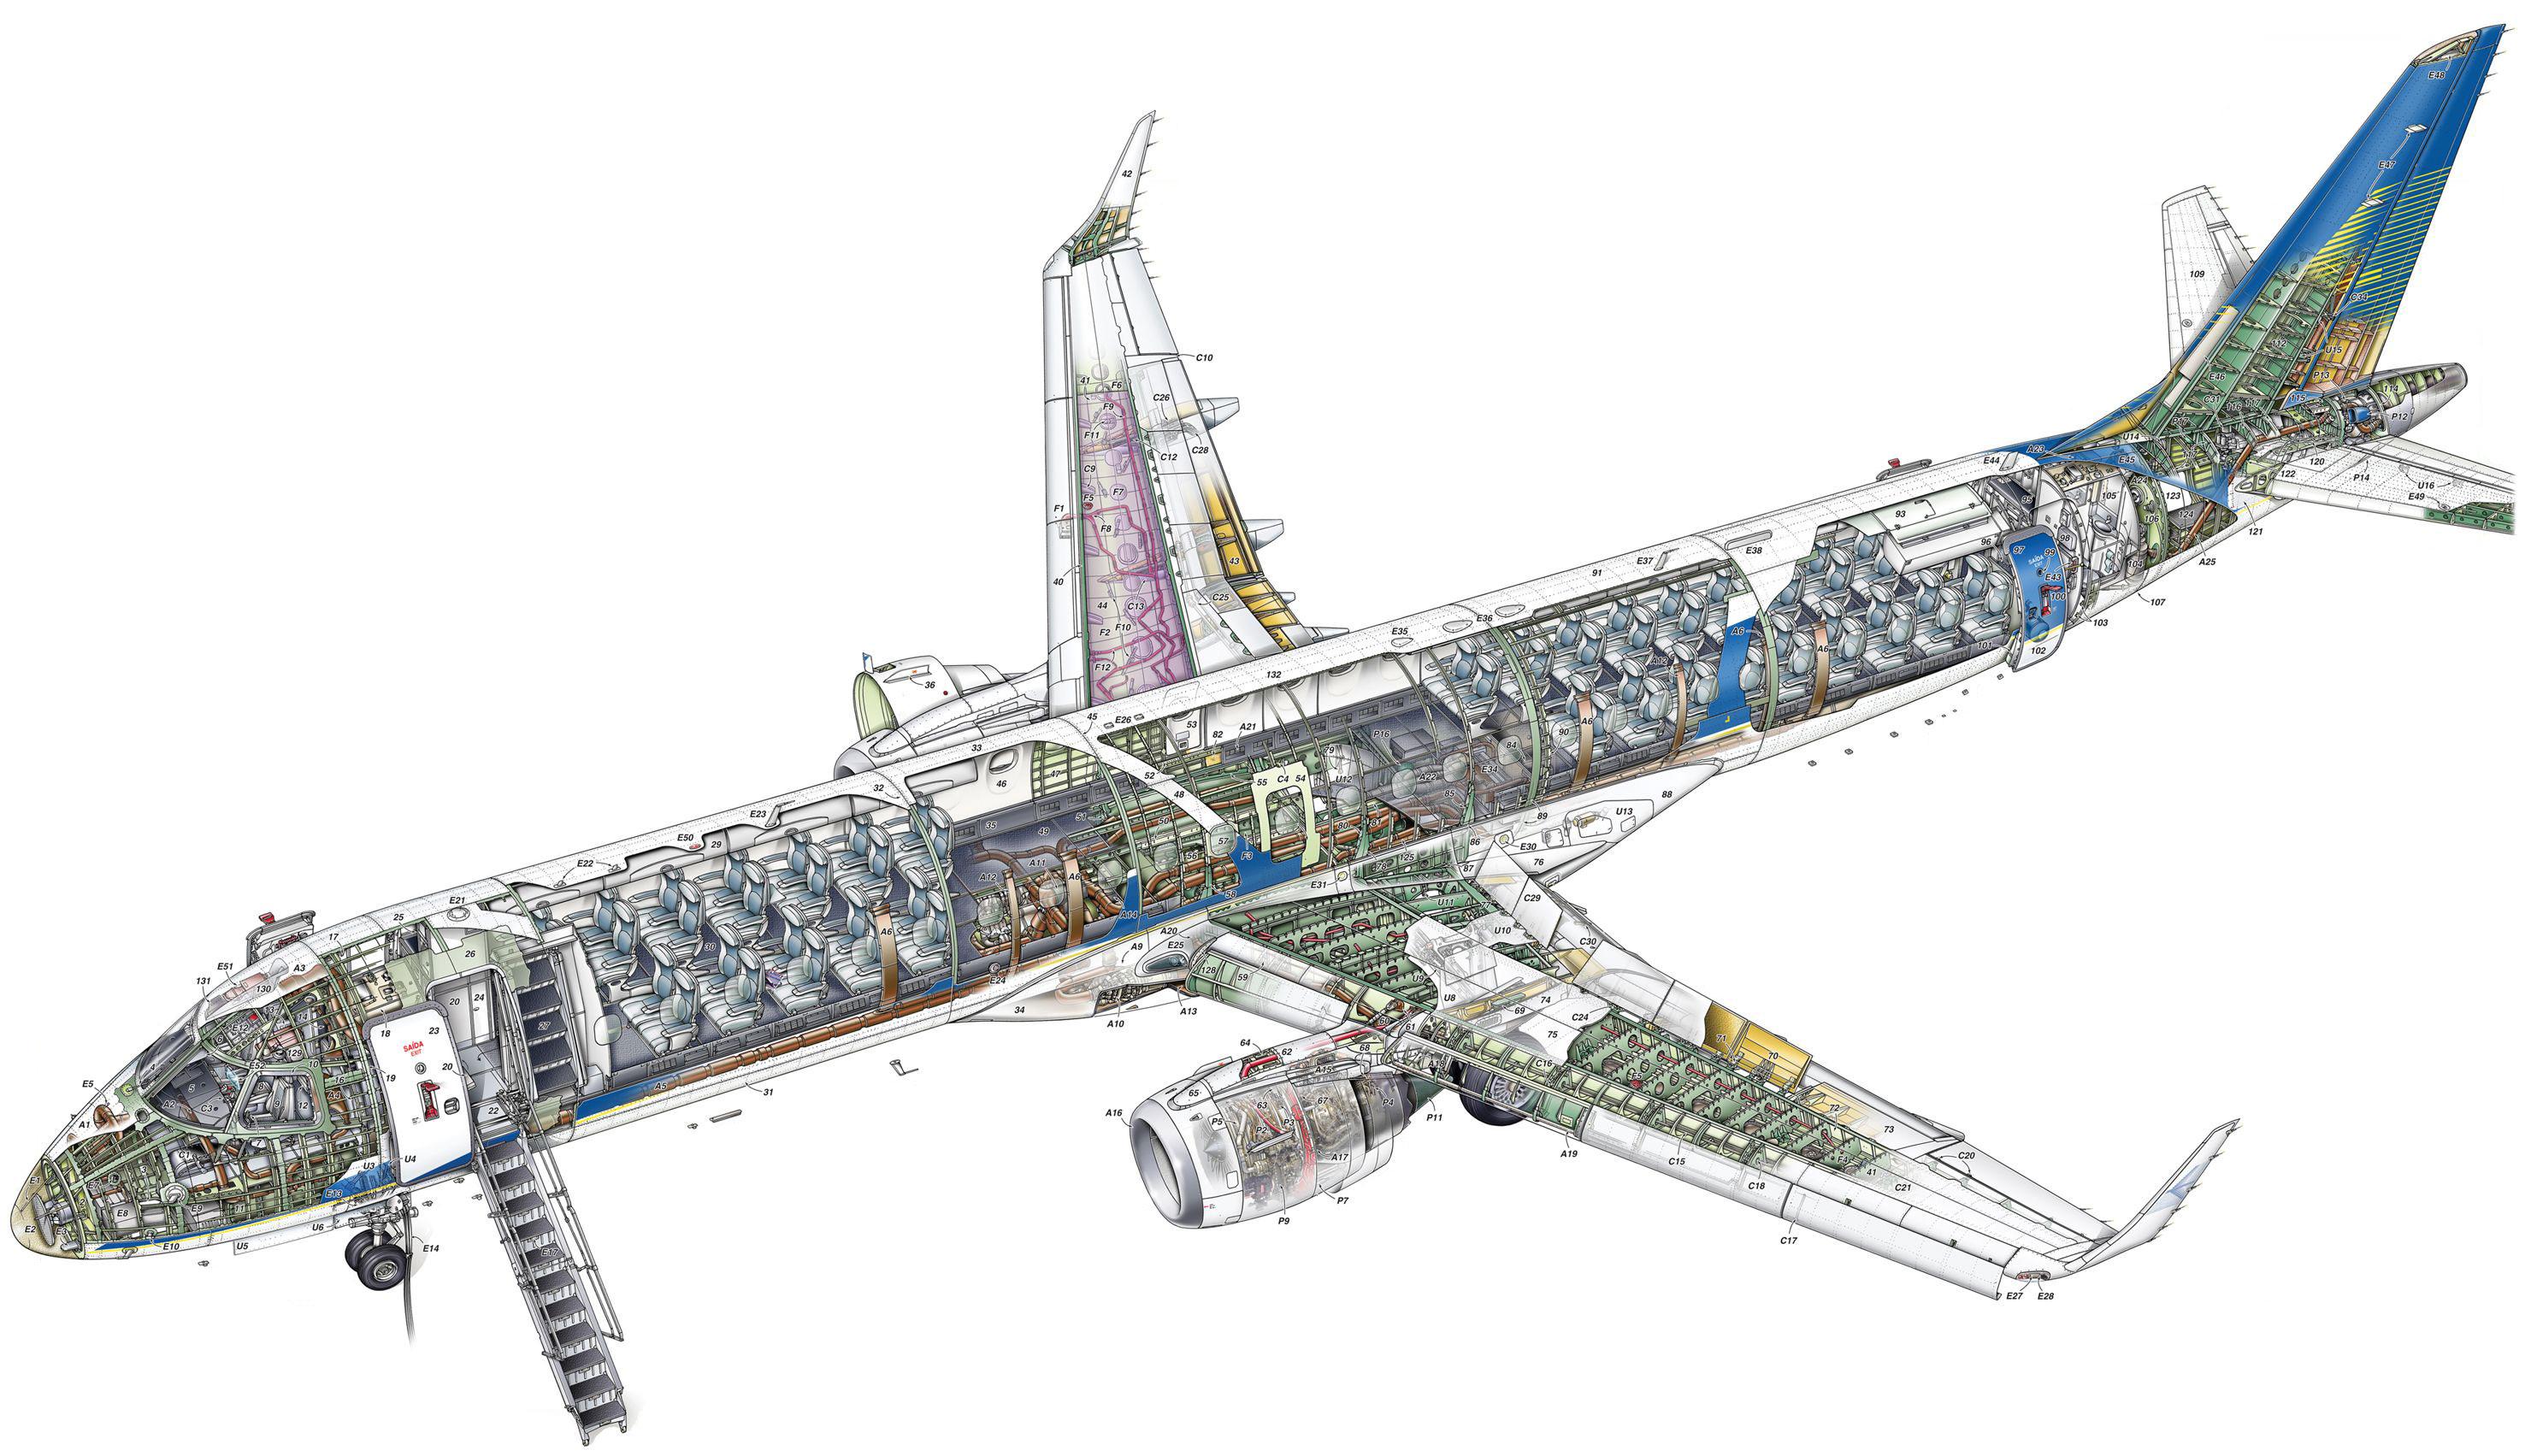 Embraer 190 cutaway drawing